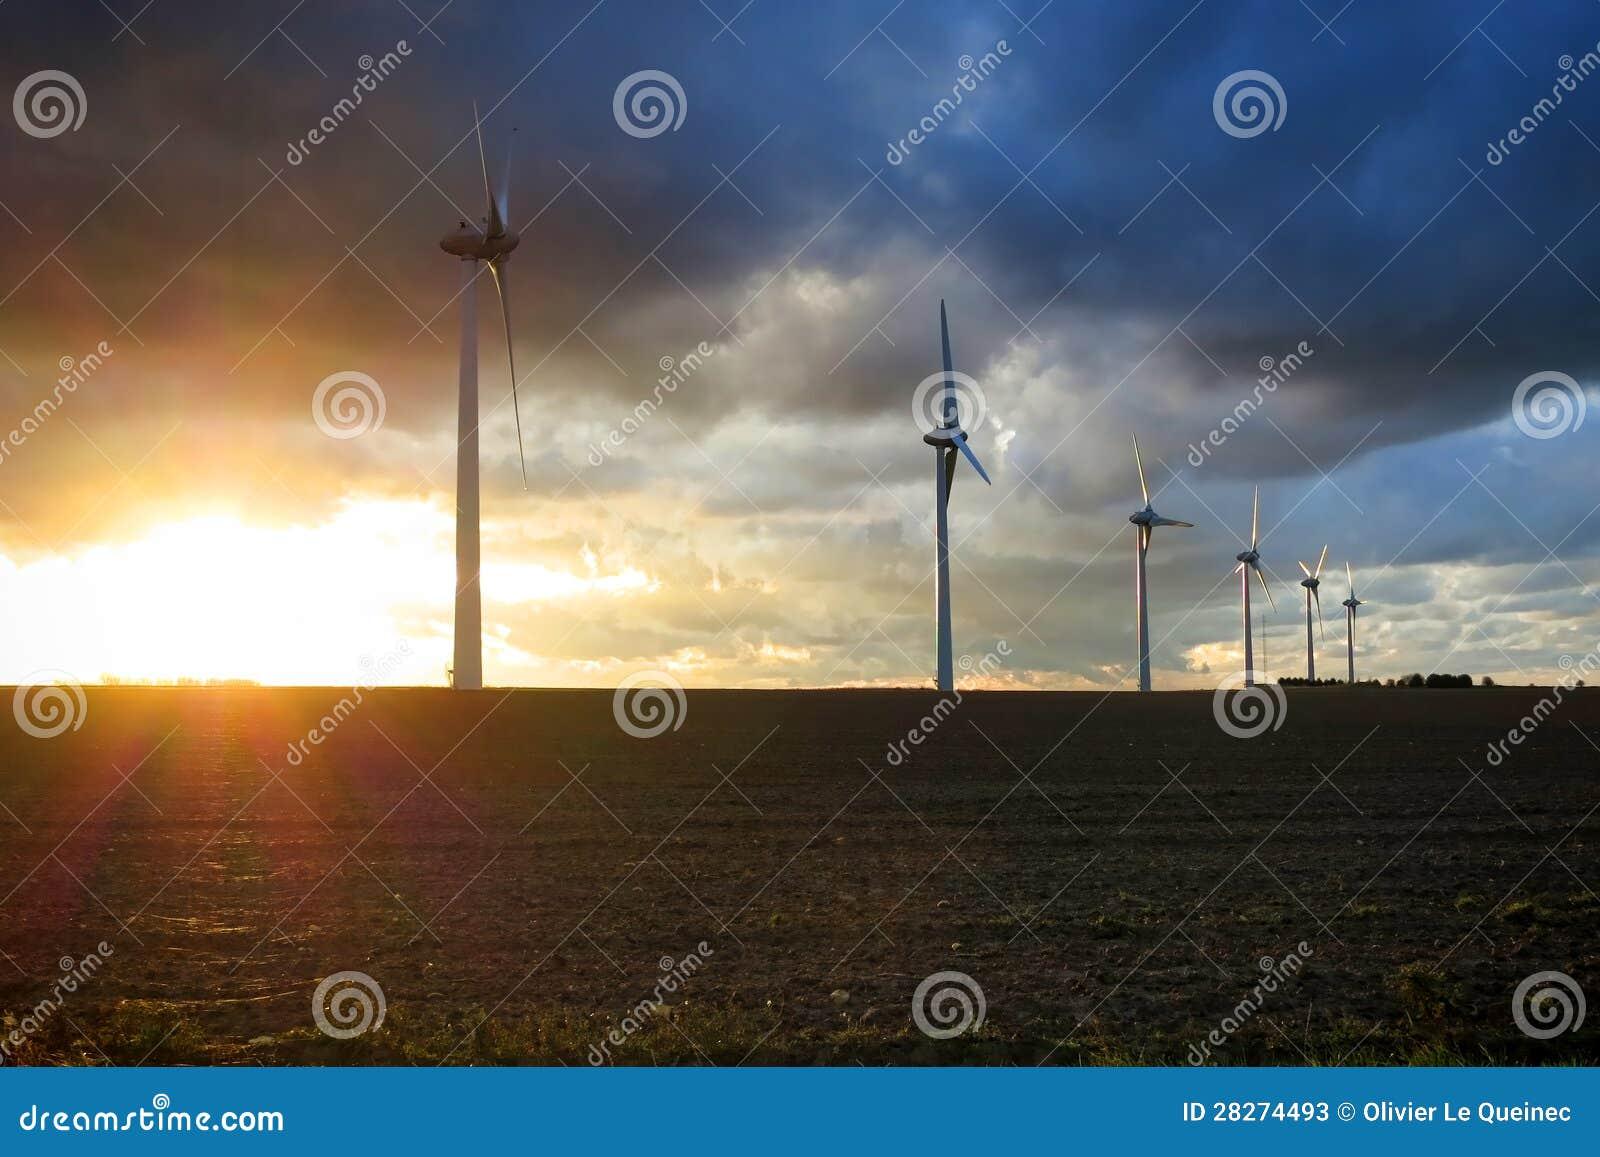 Renewable Energy Wind Power Windmill Turbines